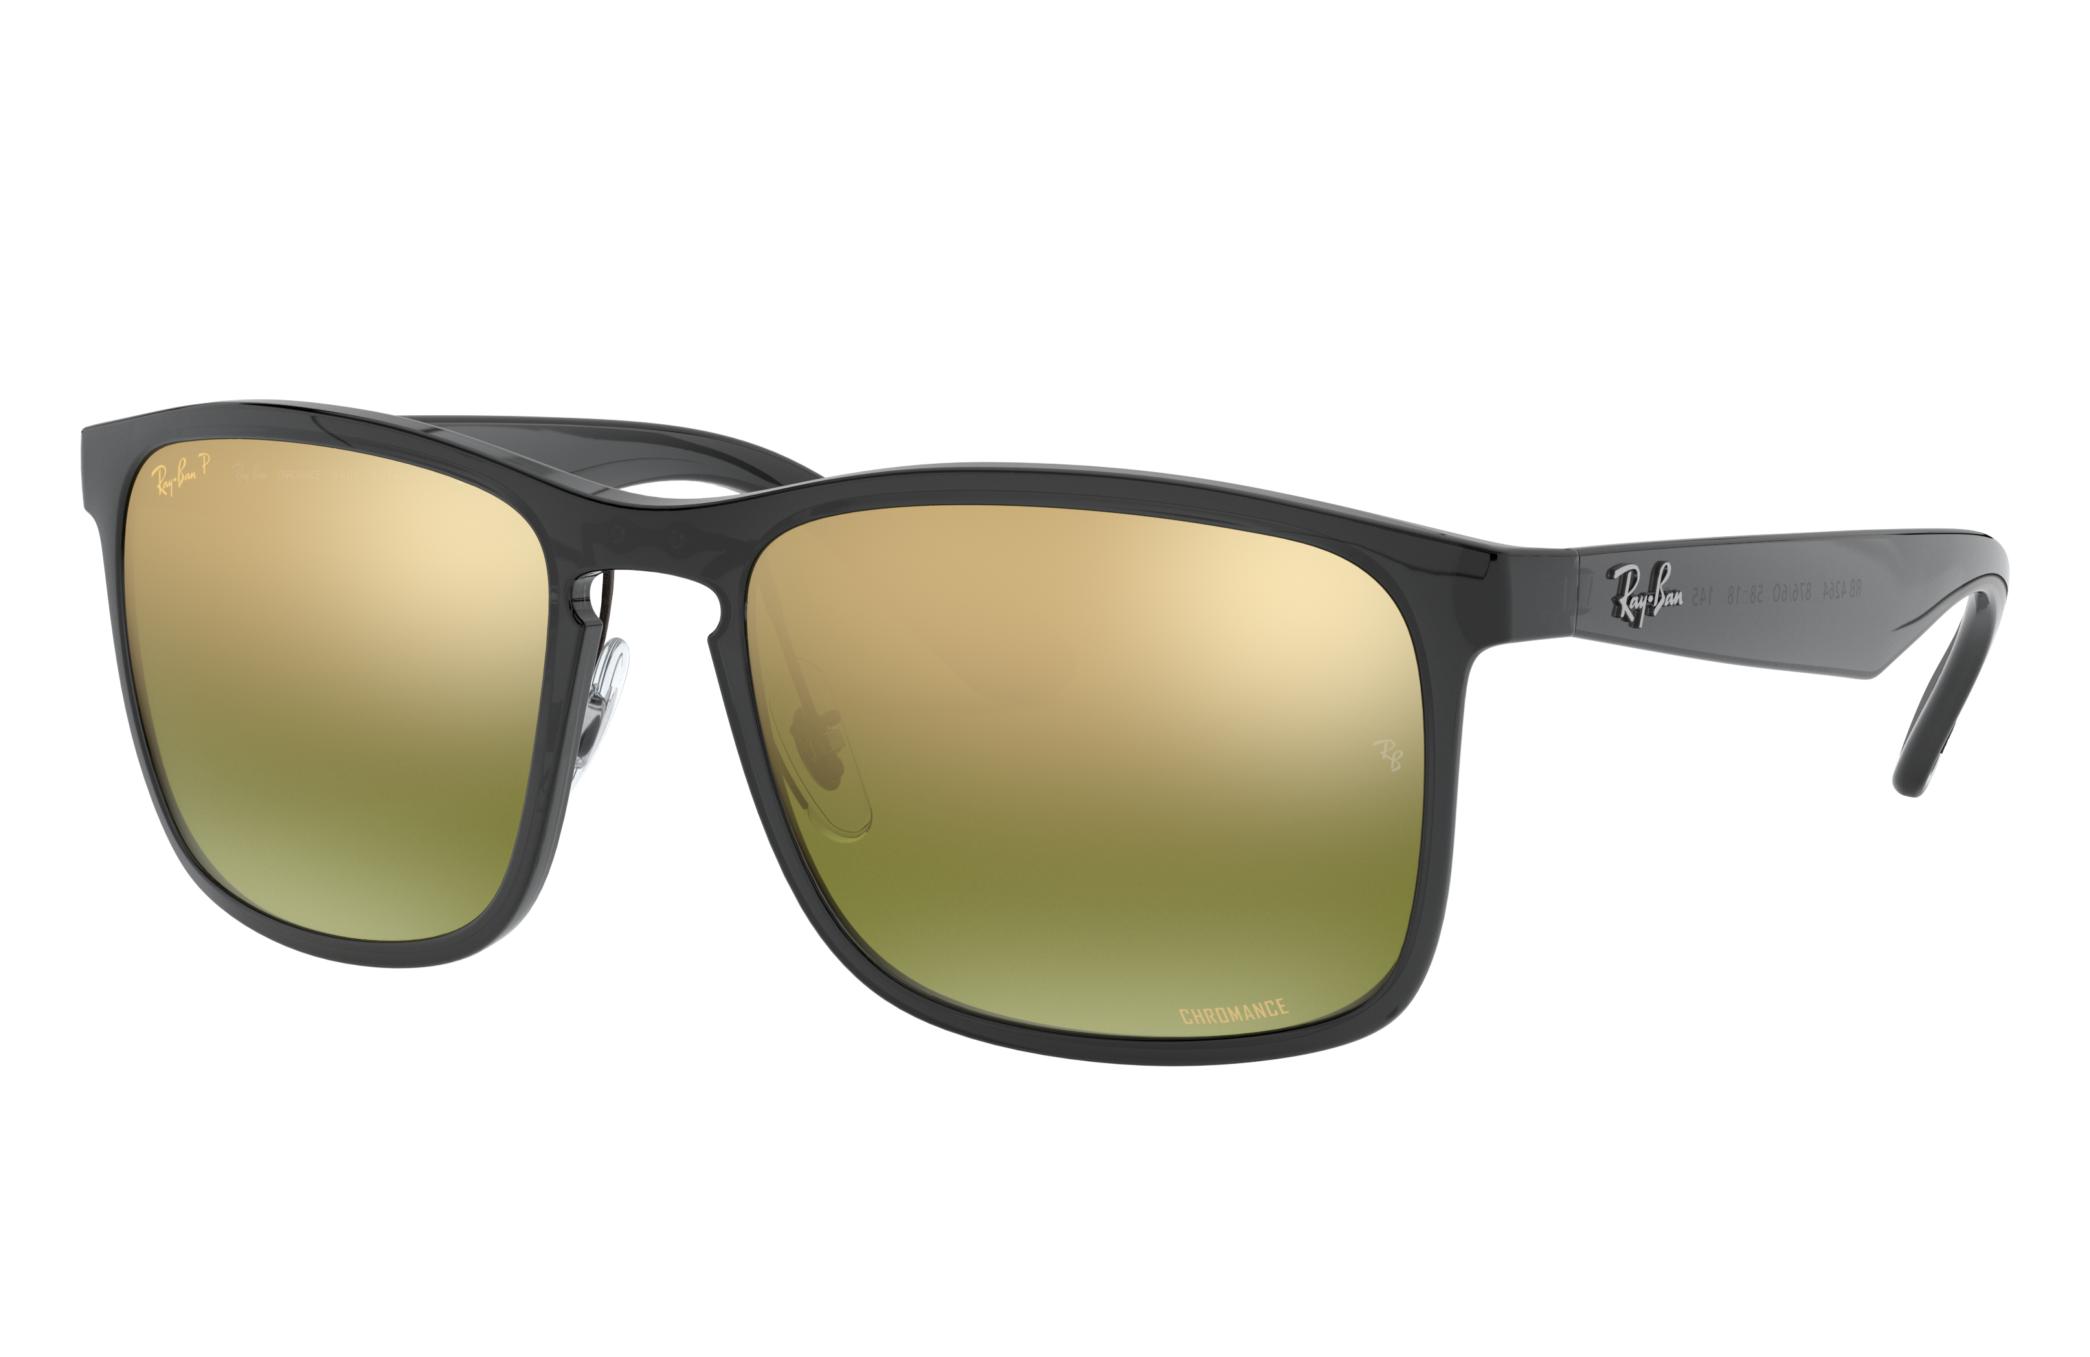 Ray-Ban Rb4264 Chromance Grey, Polarized Green Lenses - RB4264